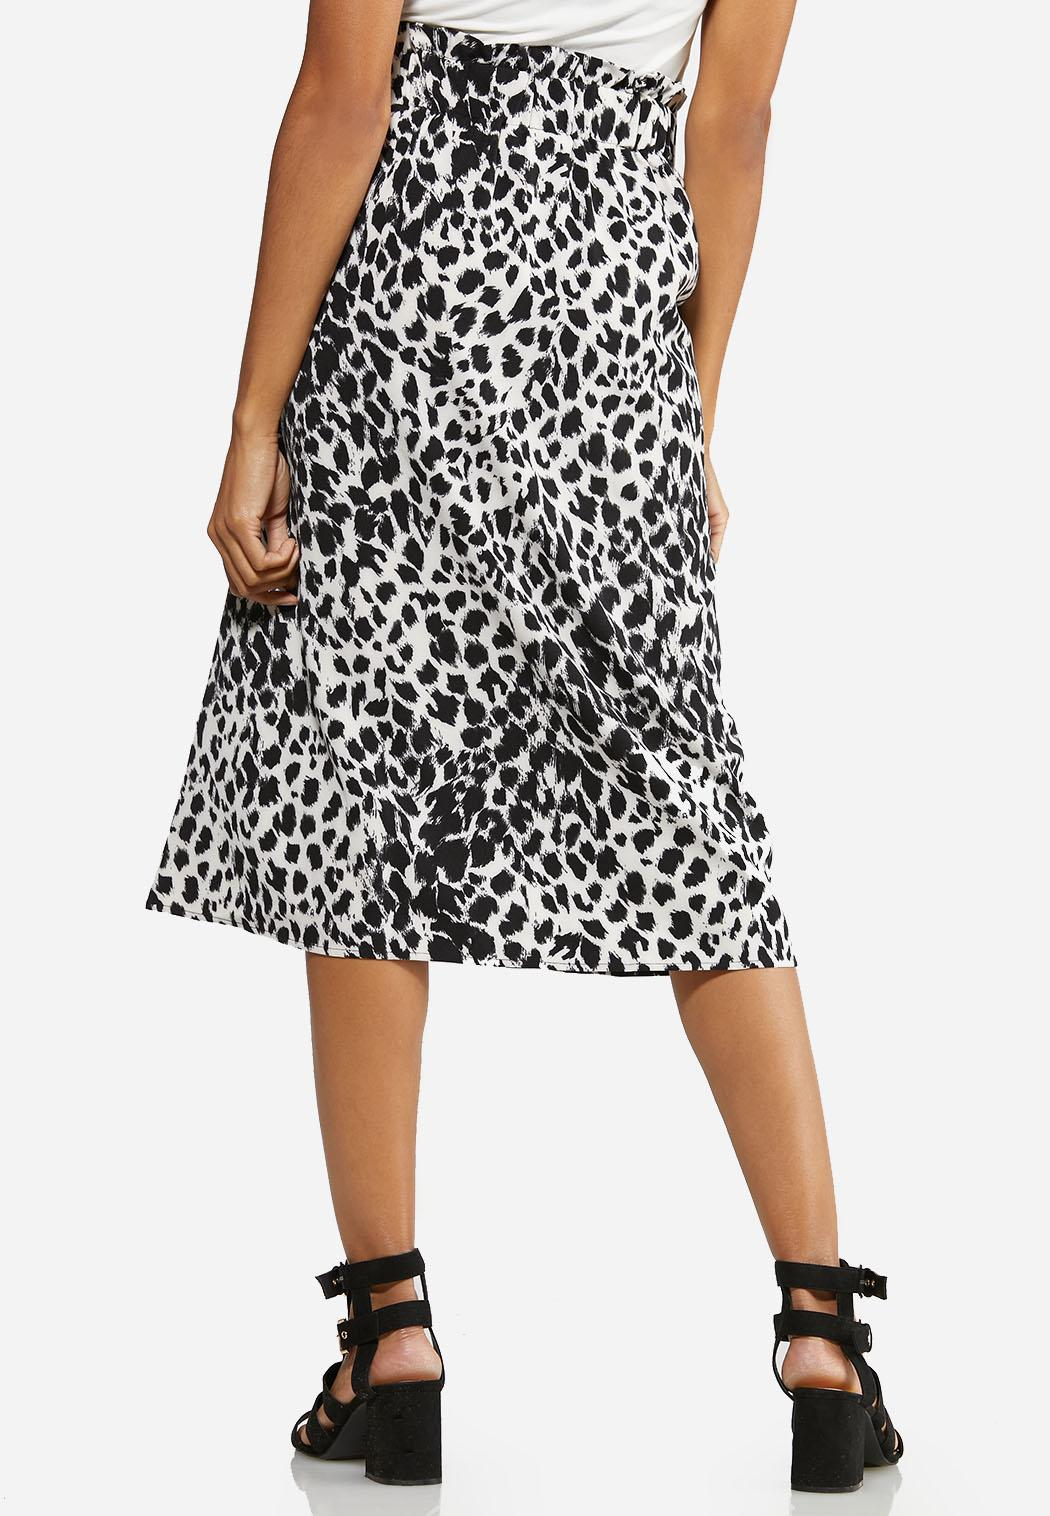 Plus Size Black White Leopard Midi Skirt (Item #43940758)